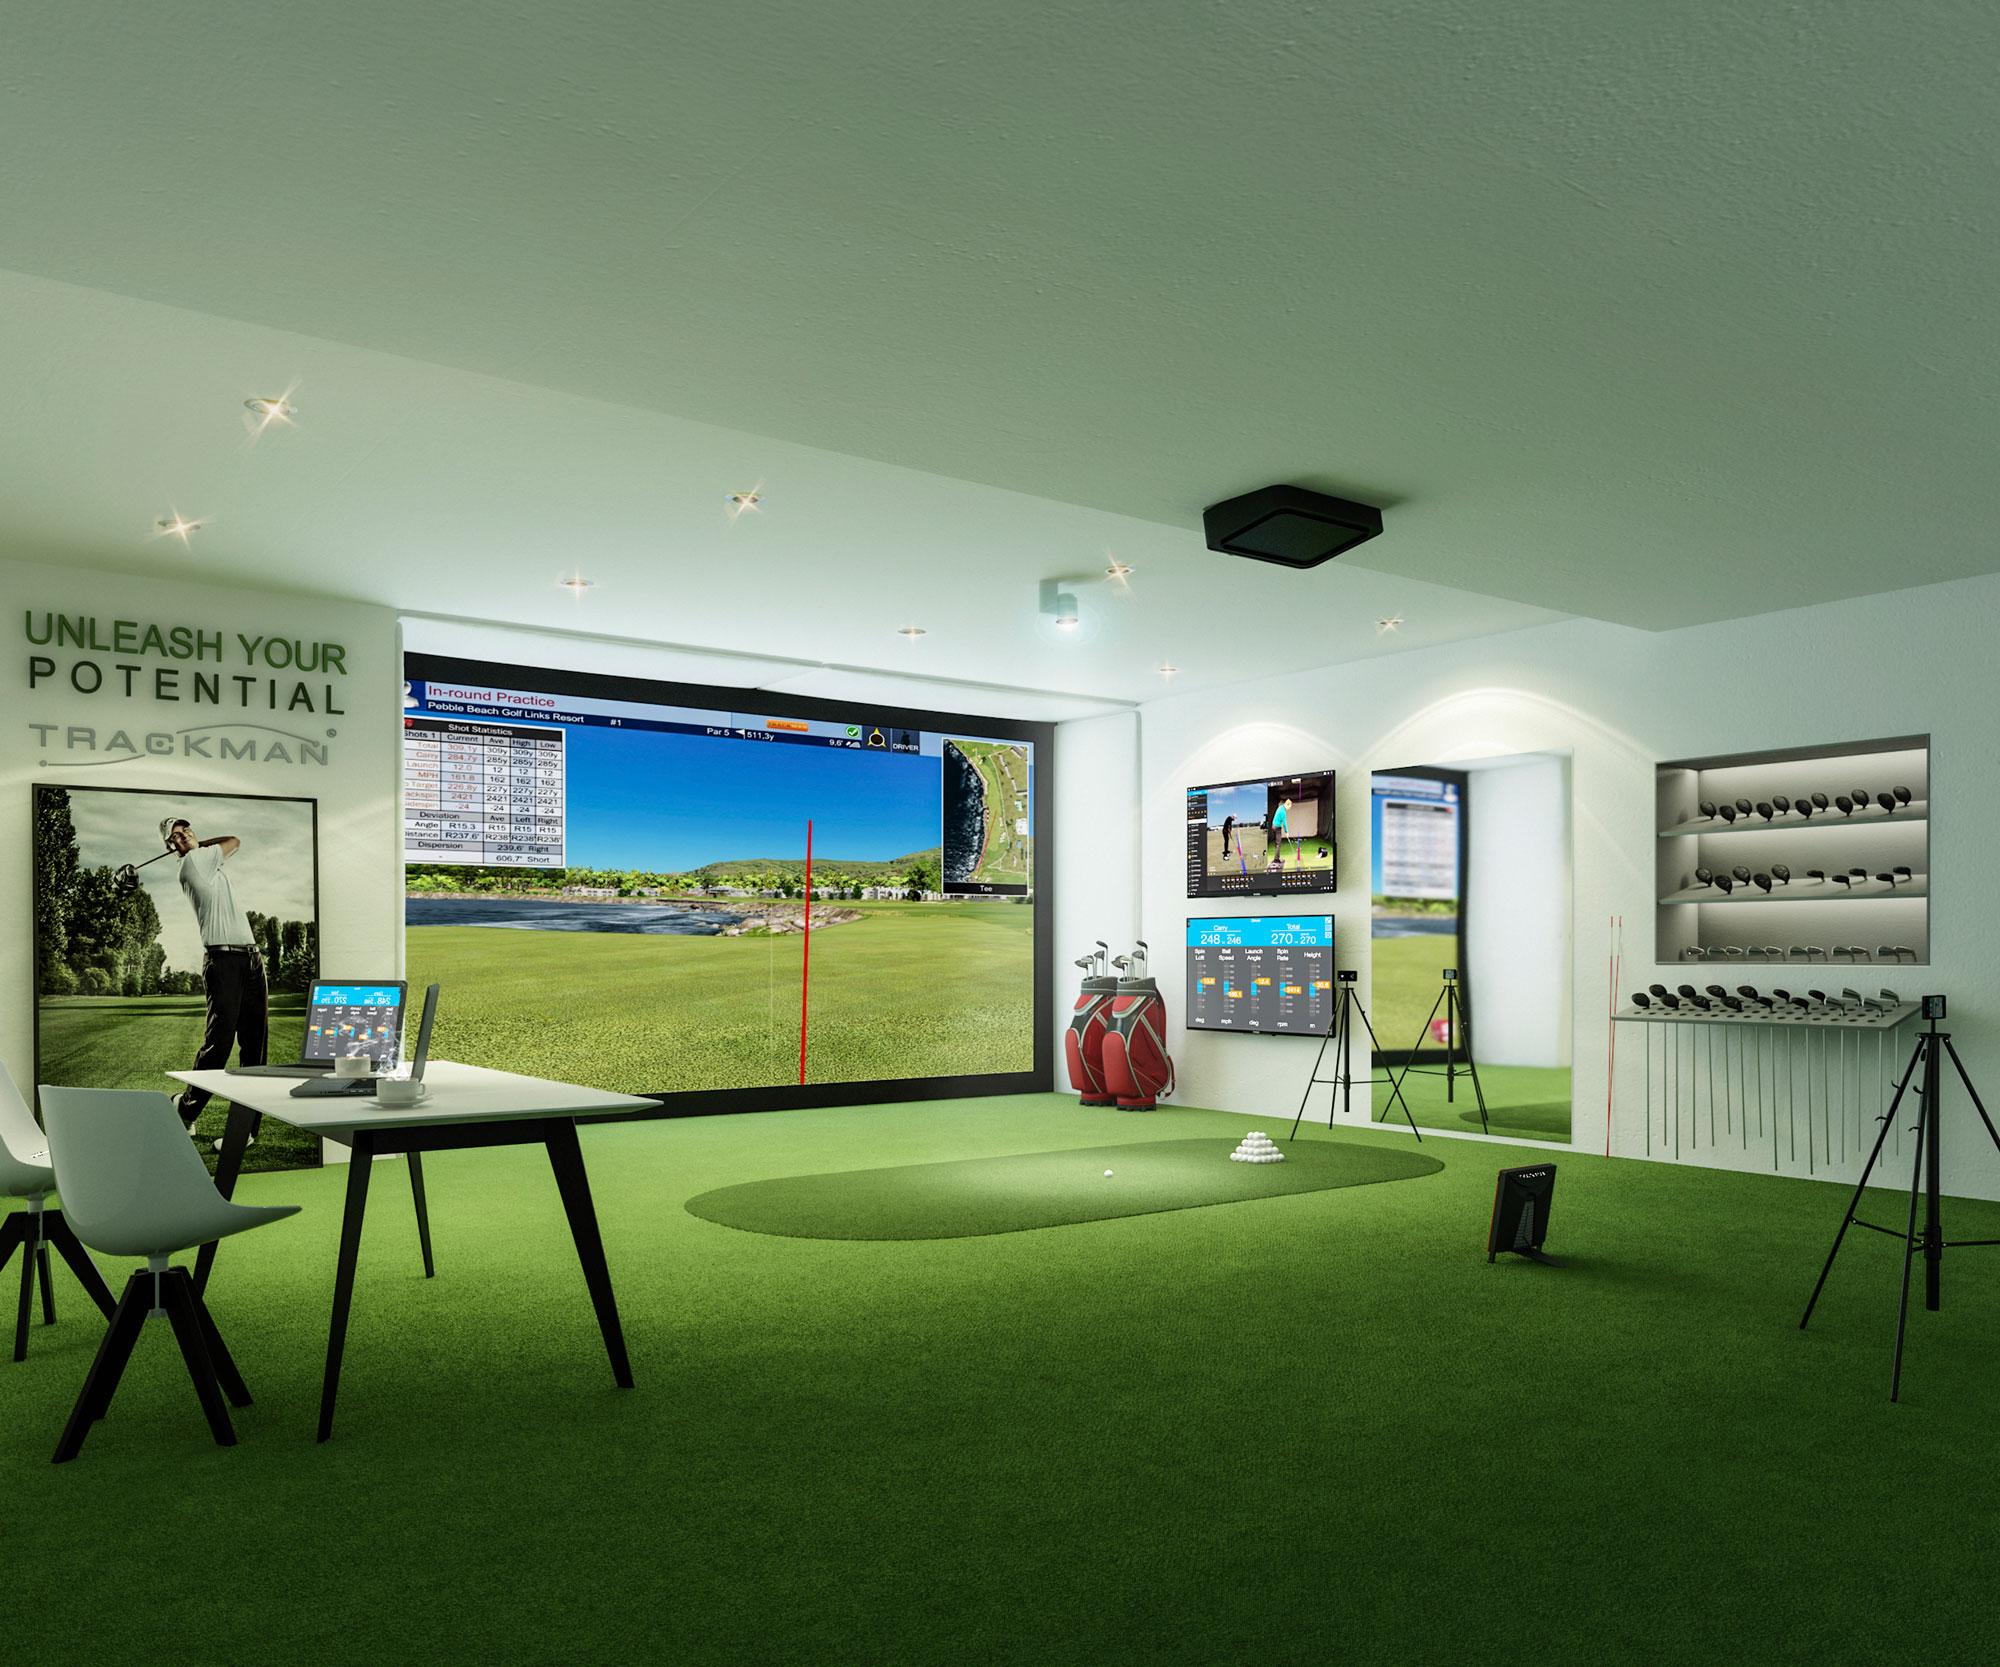 TrackMan-Indoor-Facility.jpg